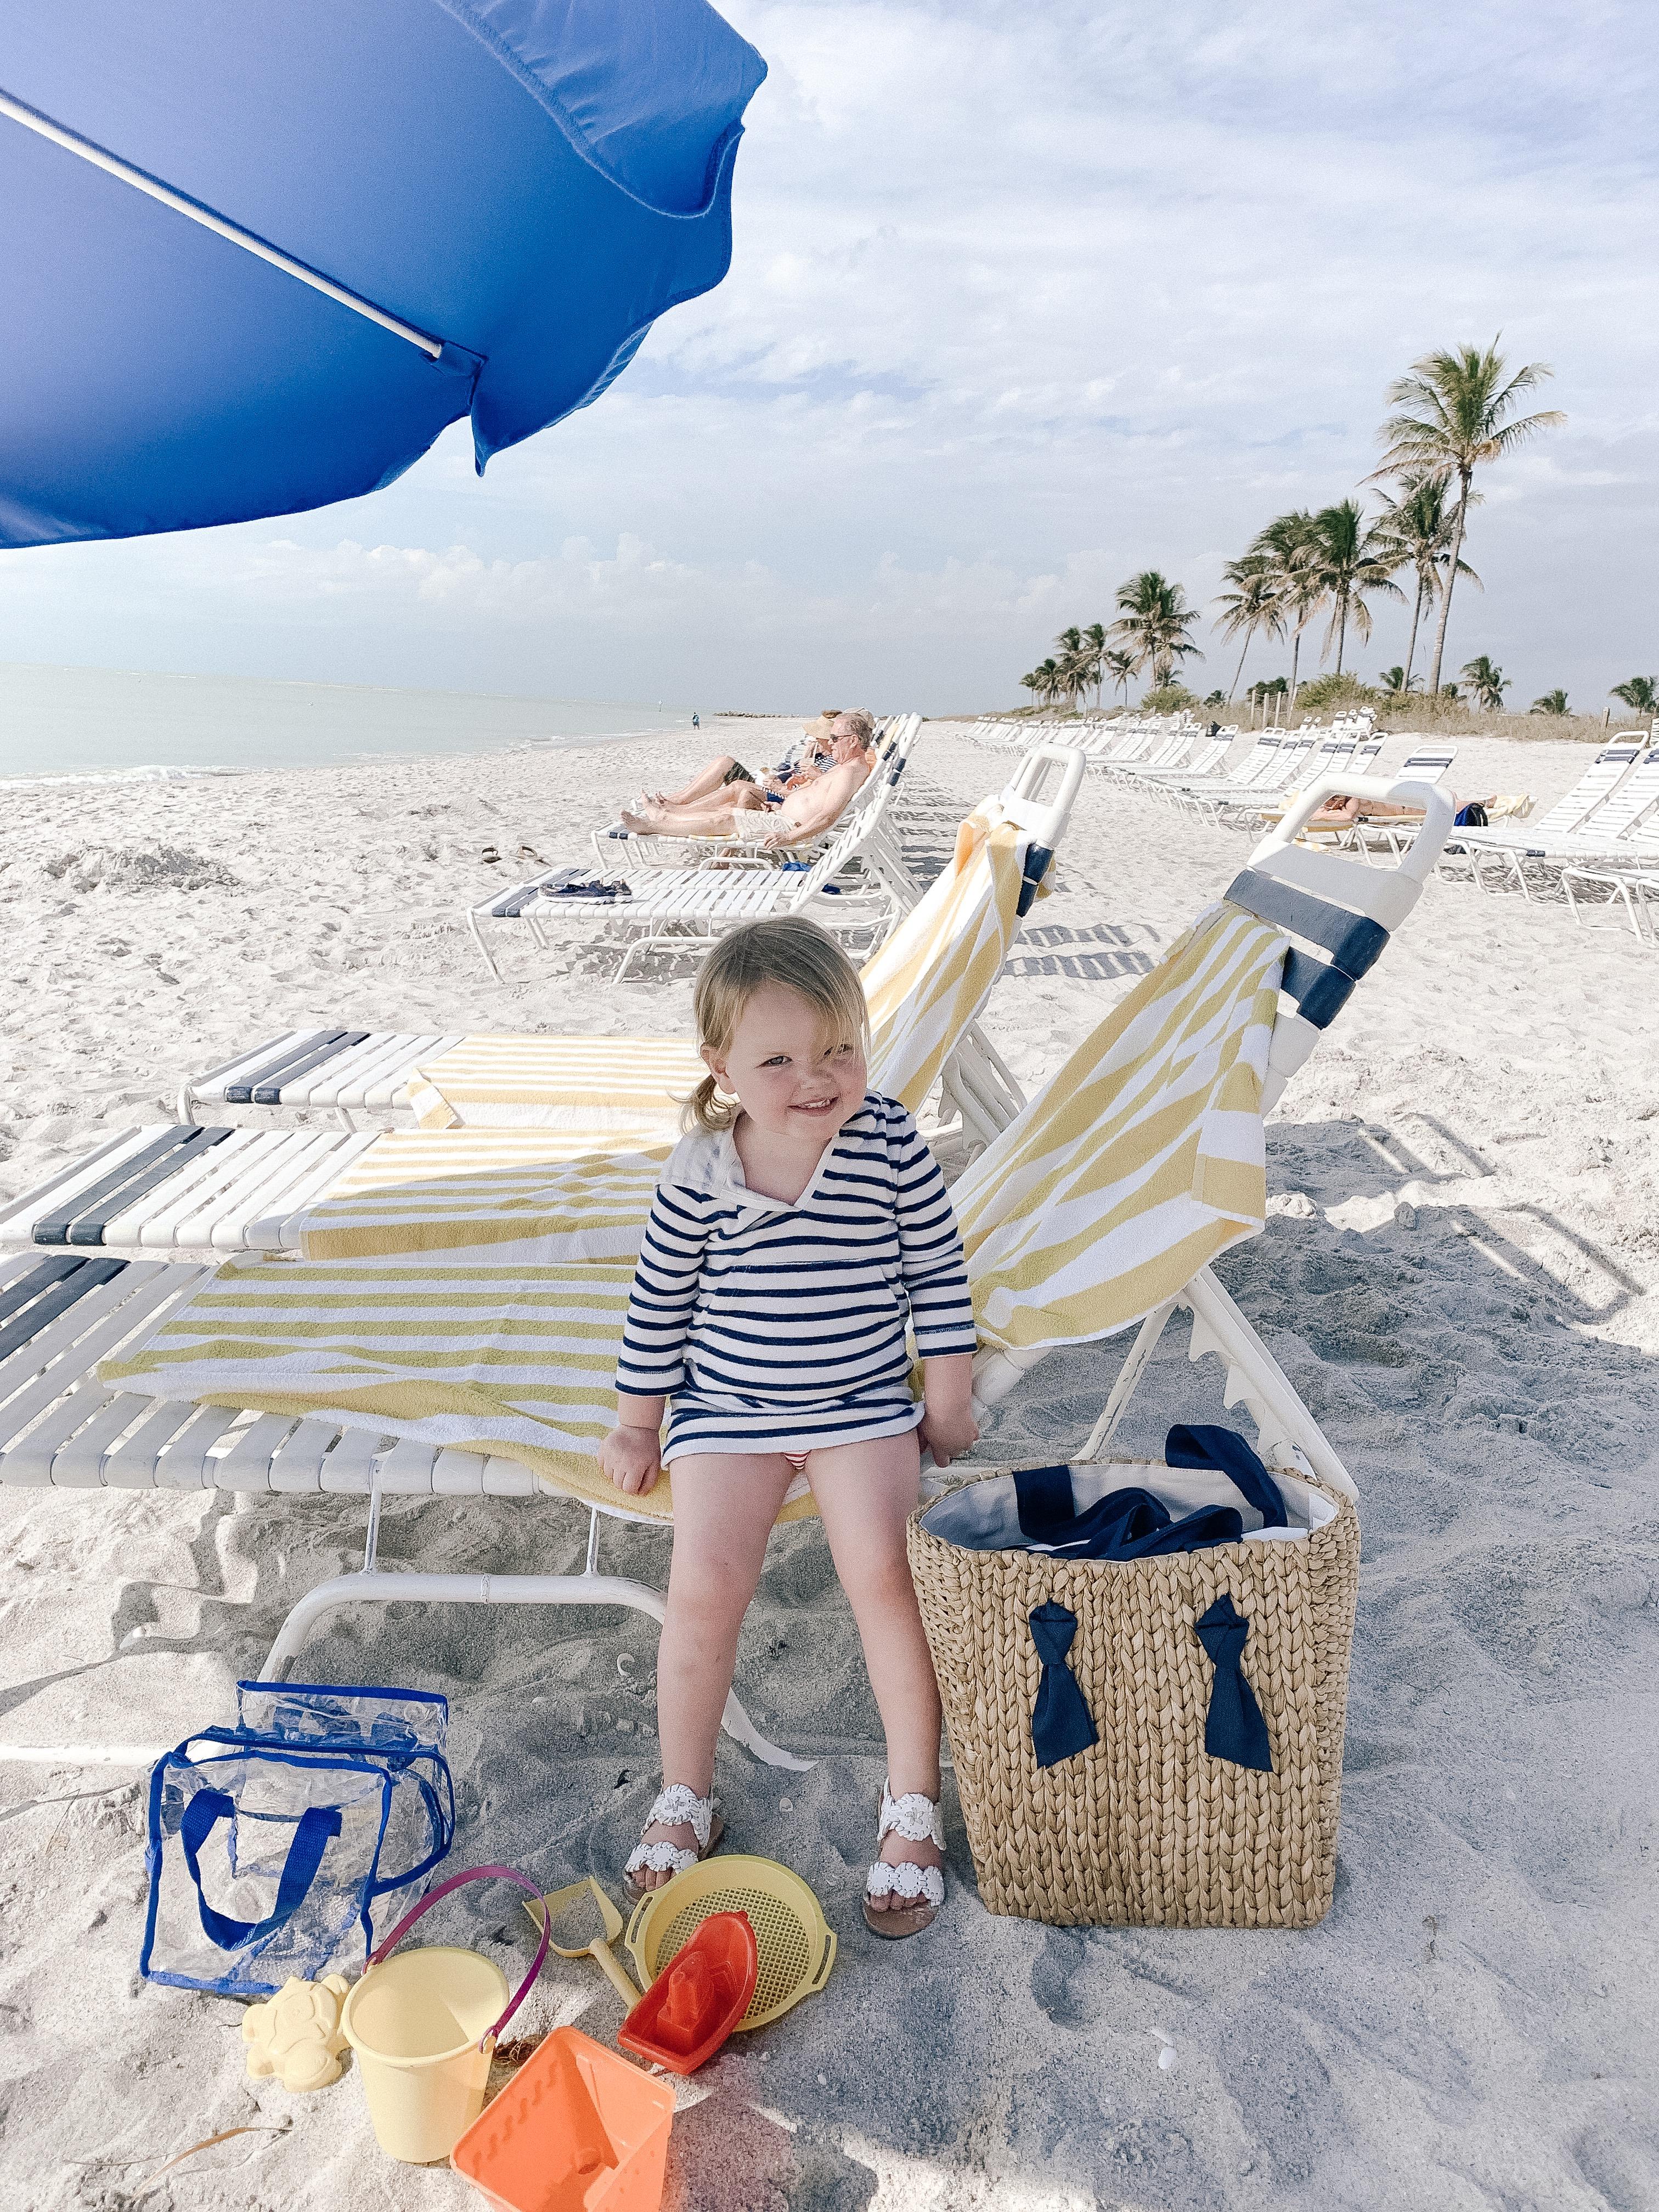 Where We Stayed:South Seas Island Resort - Emma Larkin